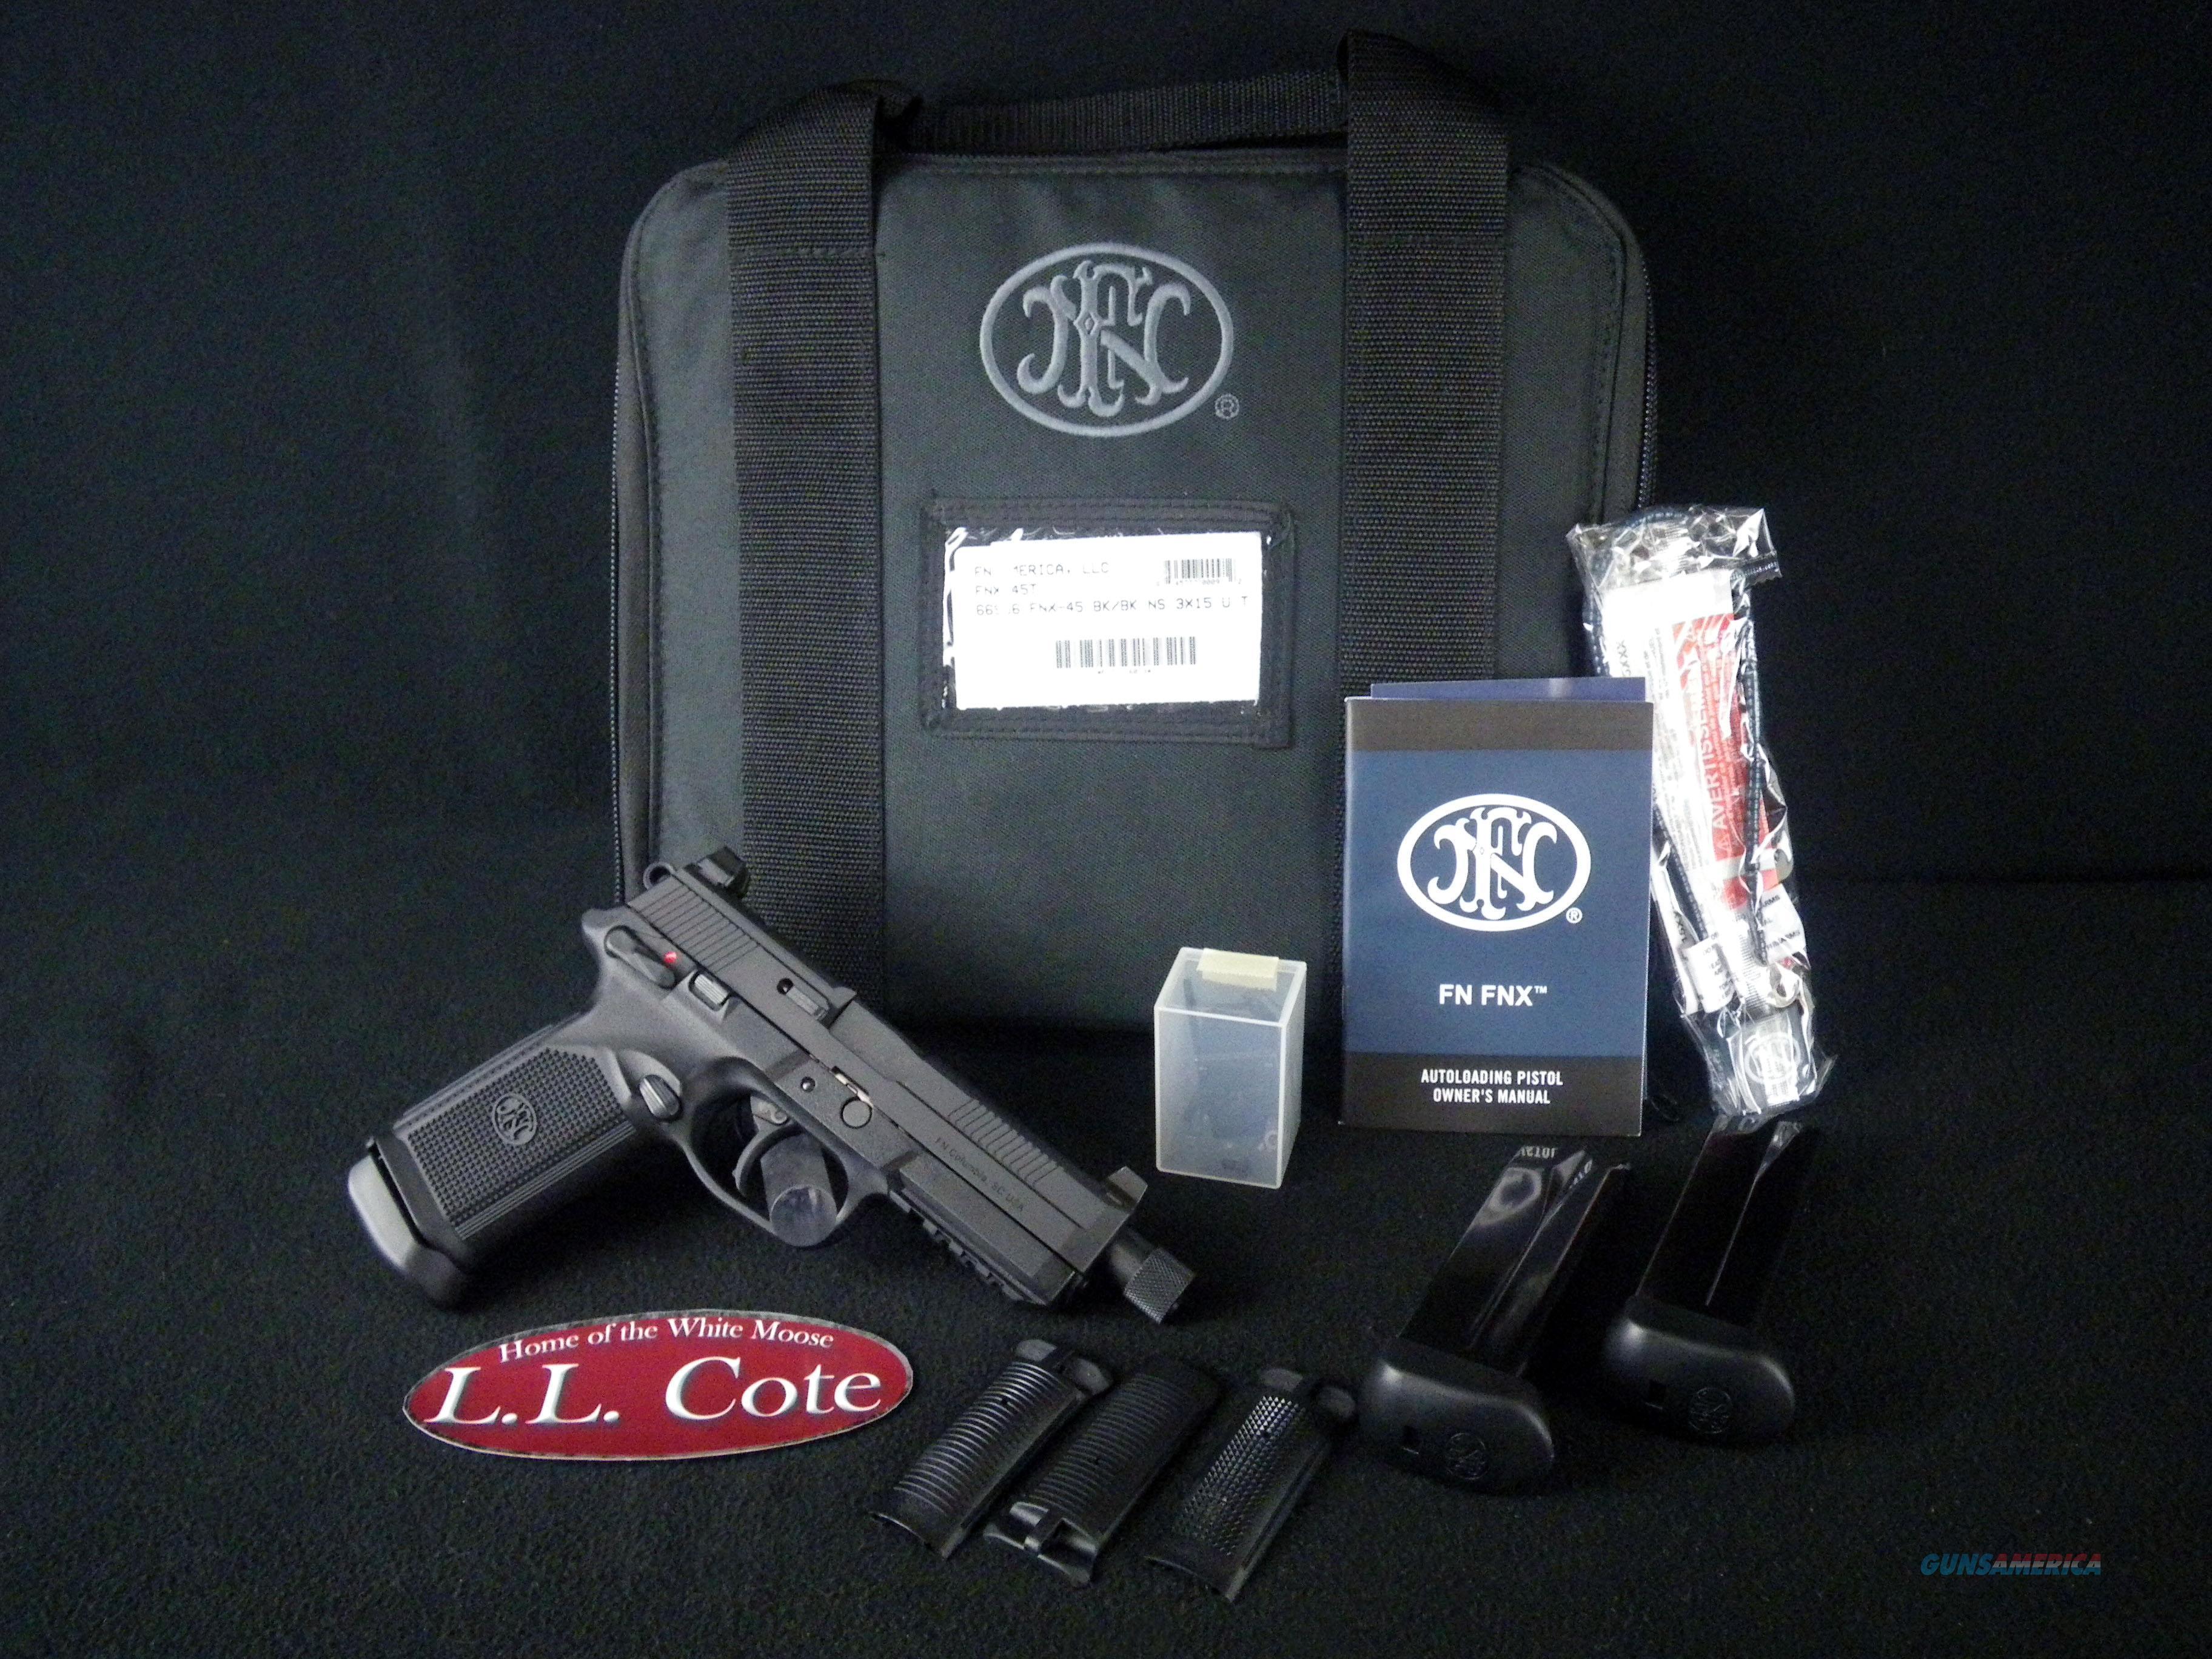 "FNH FNX-45 Tactical 45ACP 5.3"" NEW 66966  Guns > Pistols > FNH - Fabrique Nationale (FN) Pistols > FNX"